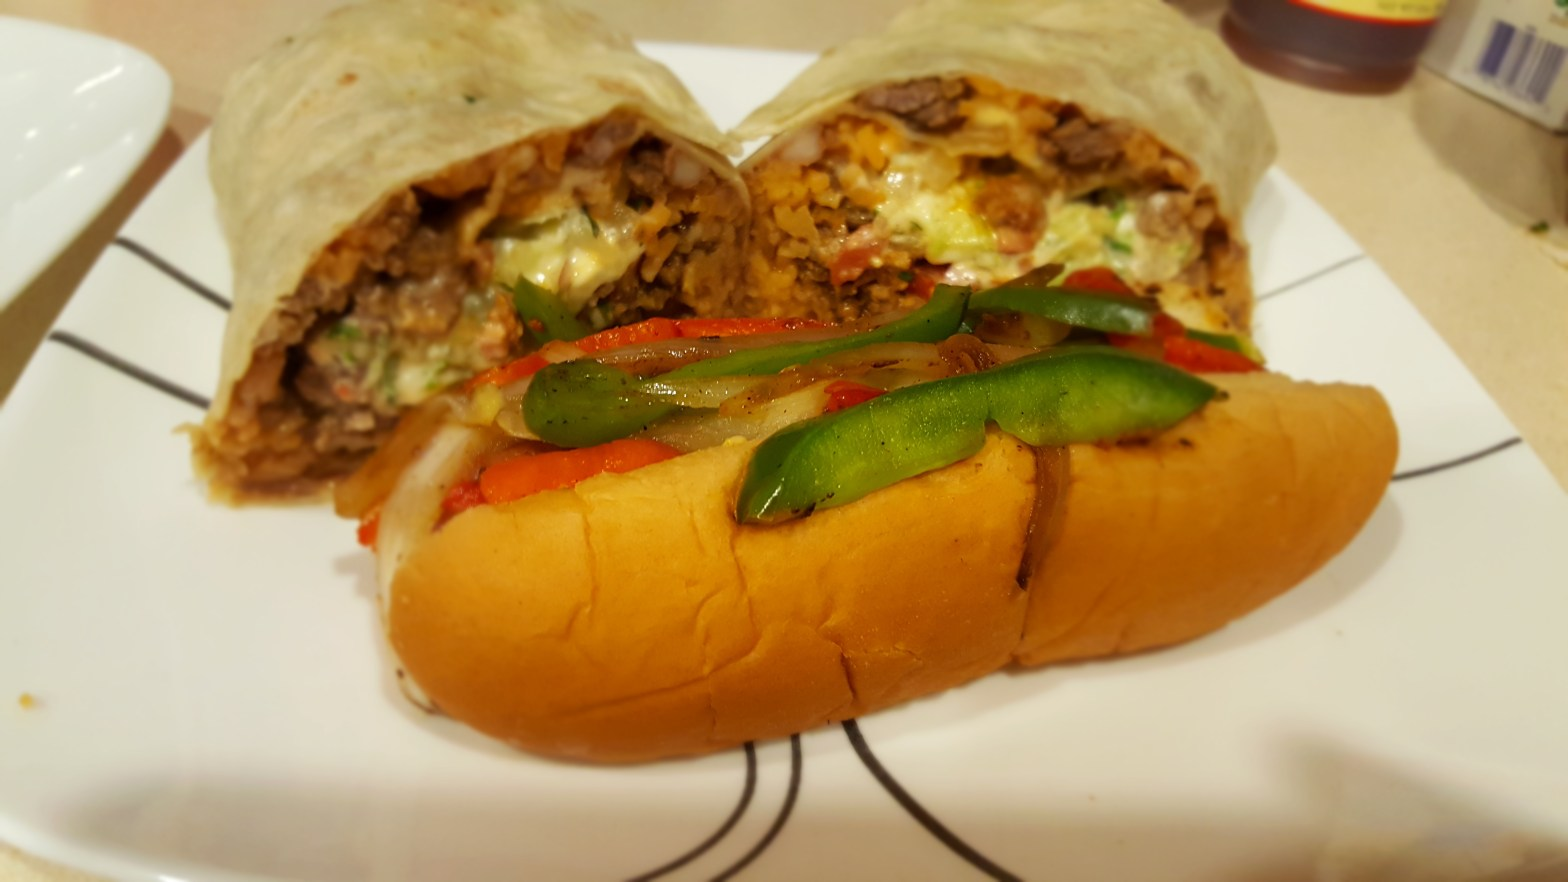 Ricky's Taco Shop Burrito and Hotdog